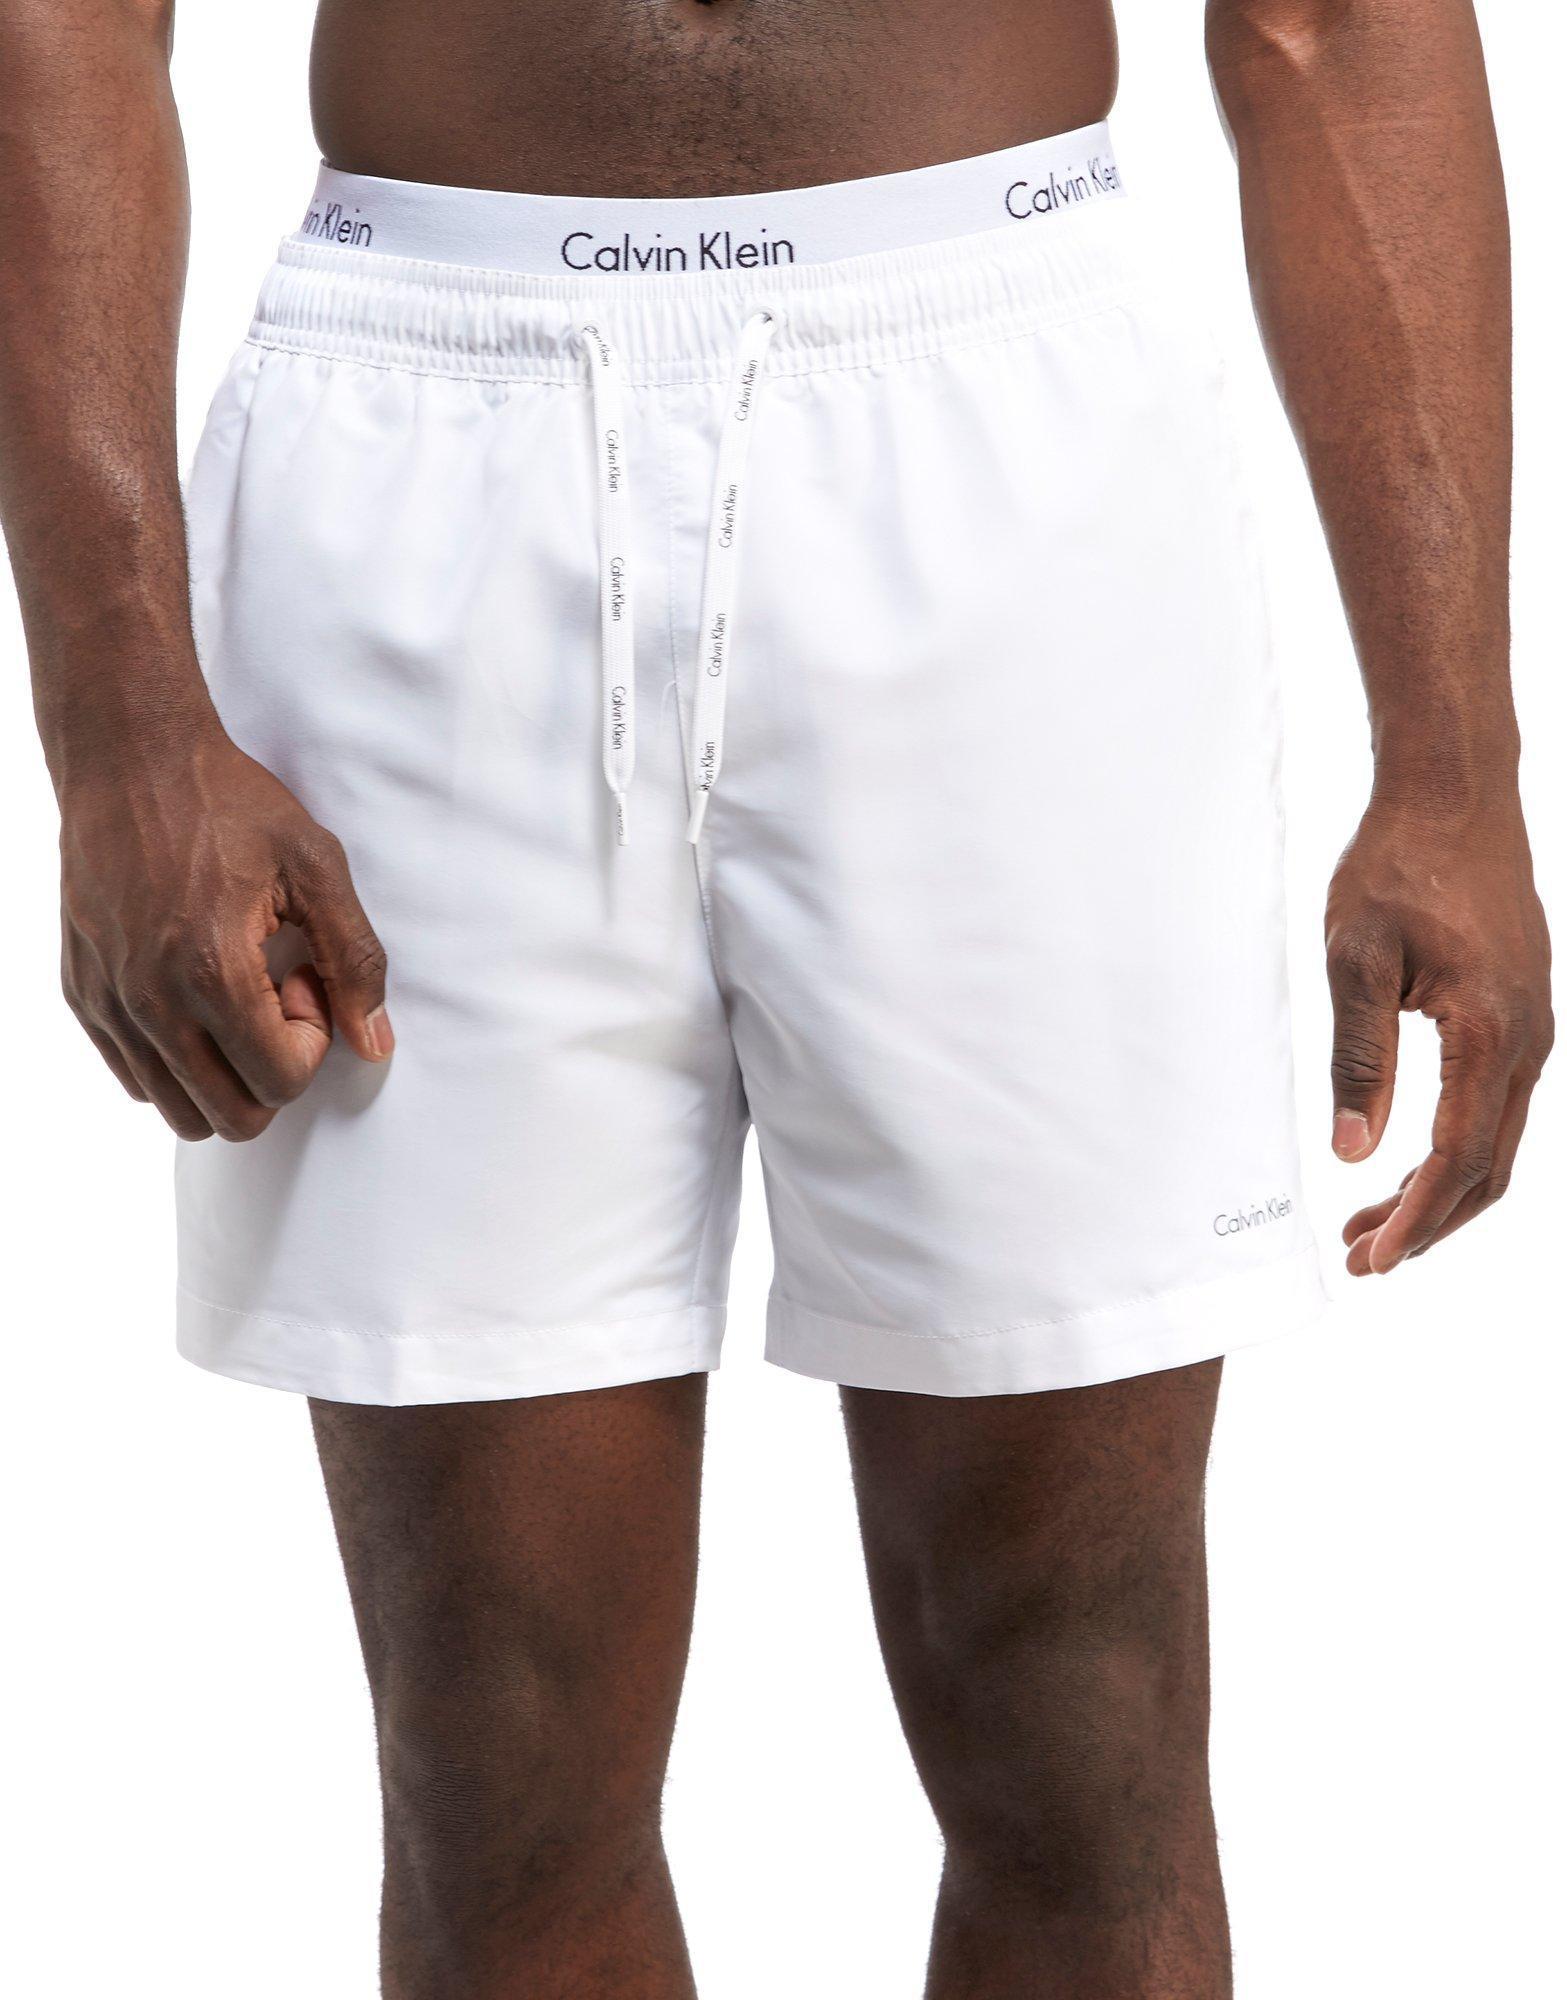 calvin klein double waist band swim shorts in white for men lyst. Black Bedroom Furniture Sets. Home Design Ideas